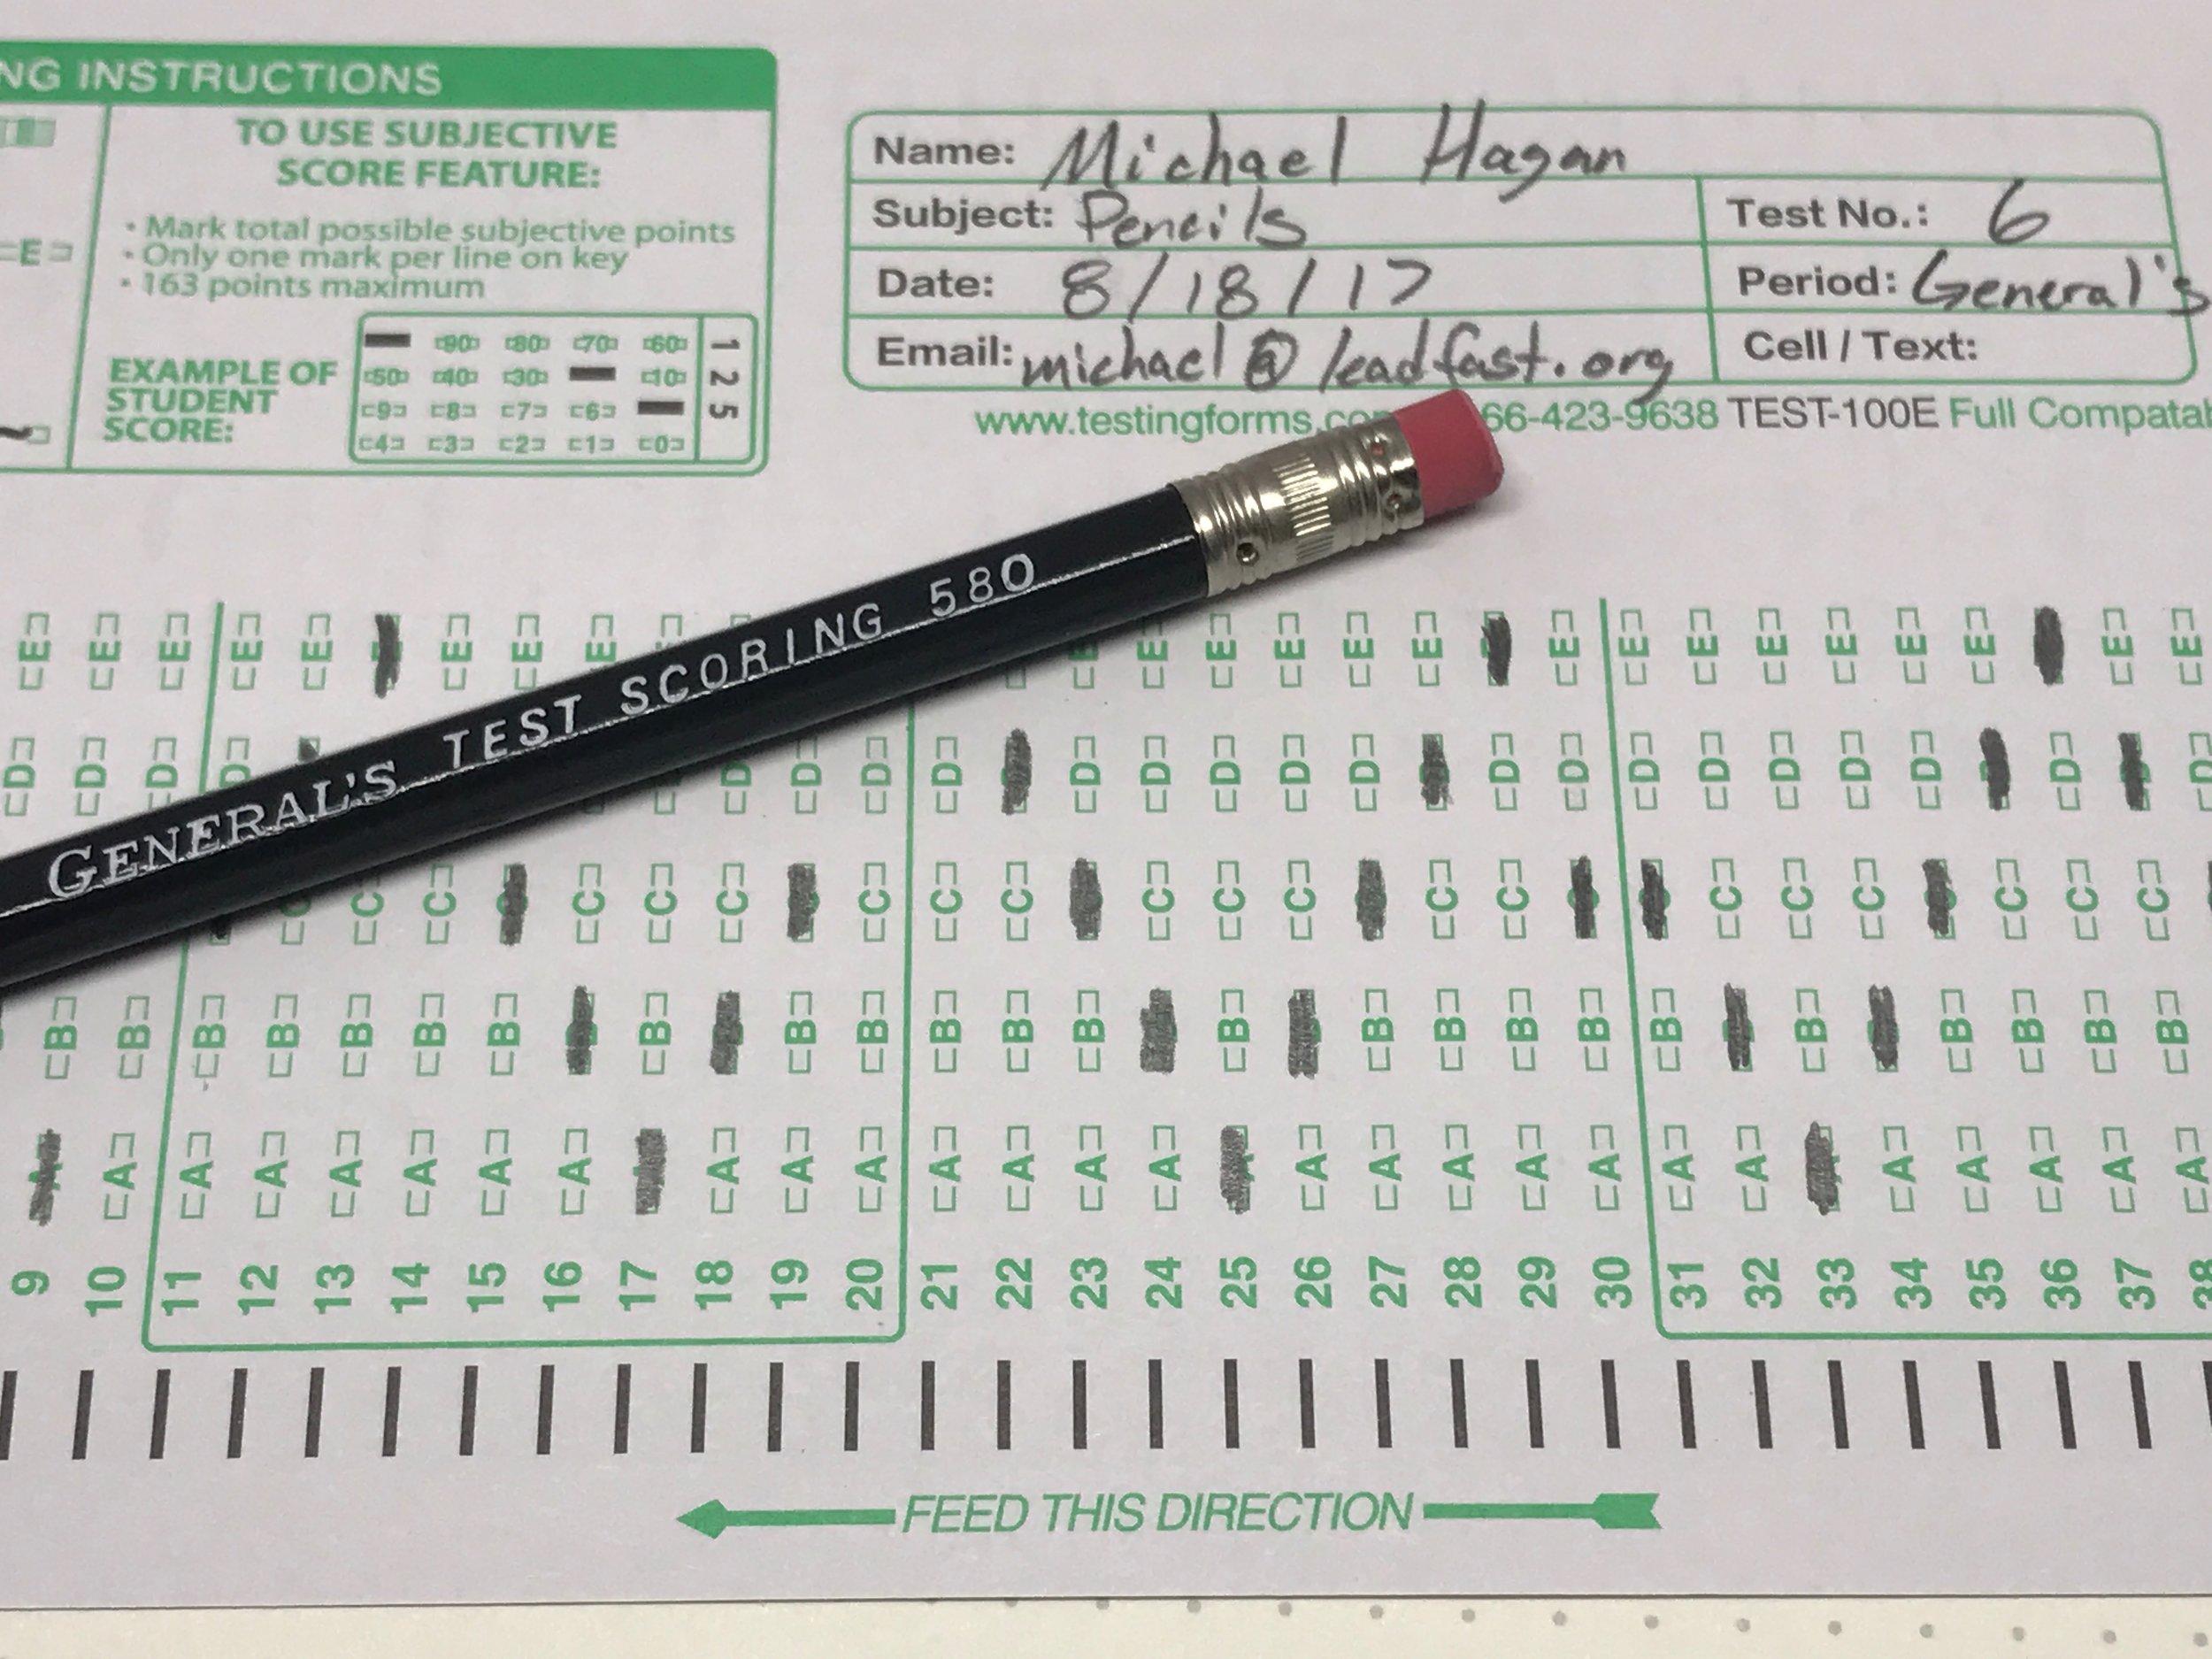 Generals-Musgrave-Test-Scoring-7.jpg